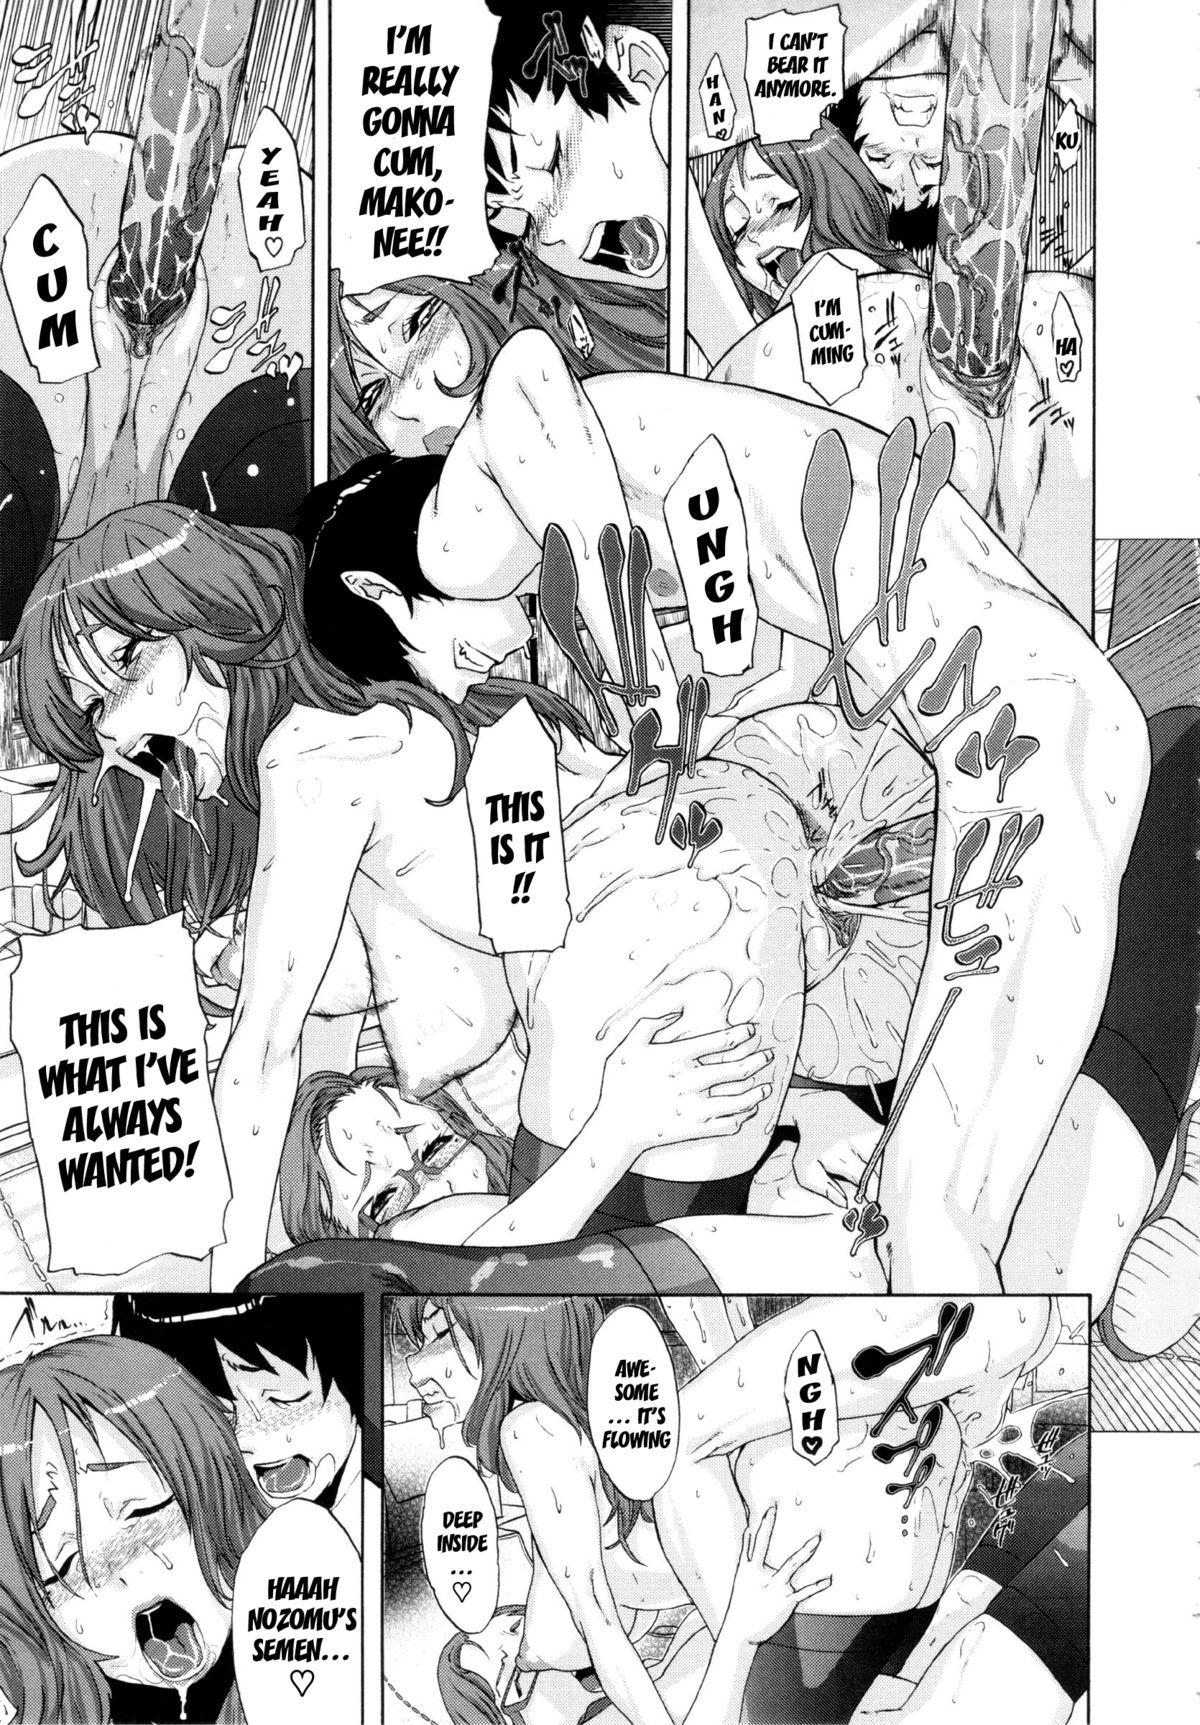 [Royal Koyanagi] Orgy Treasure Mansion GOLD Ch. 9 - 10  -  Nozomu Triangle & Orgy Showroom (Tank Version) [English] [Decensored] 24